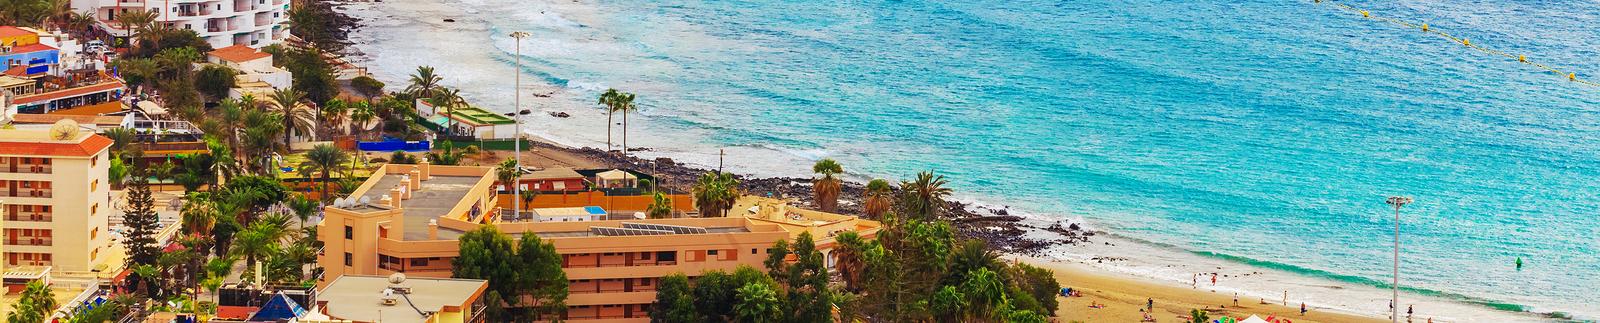 Bungalows Checkin Atlántida | Tenerife | Web Oficial